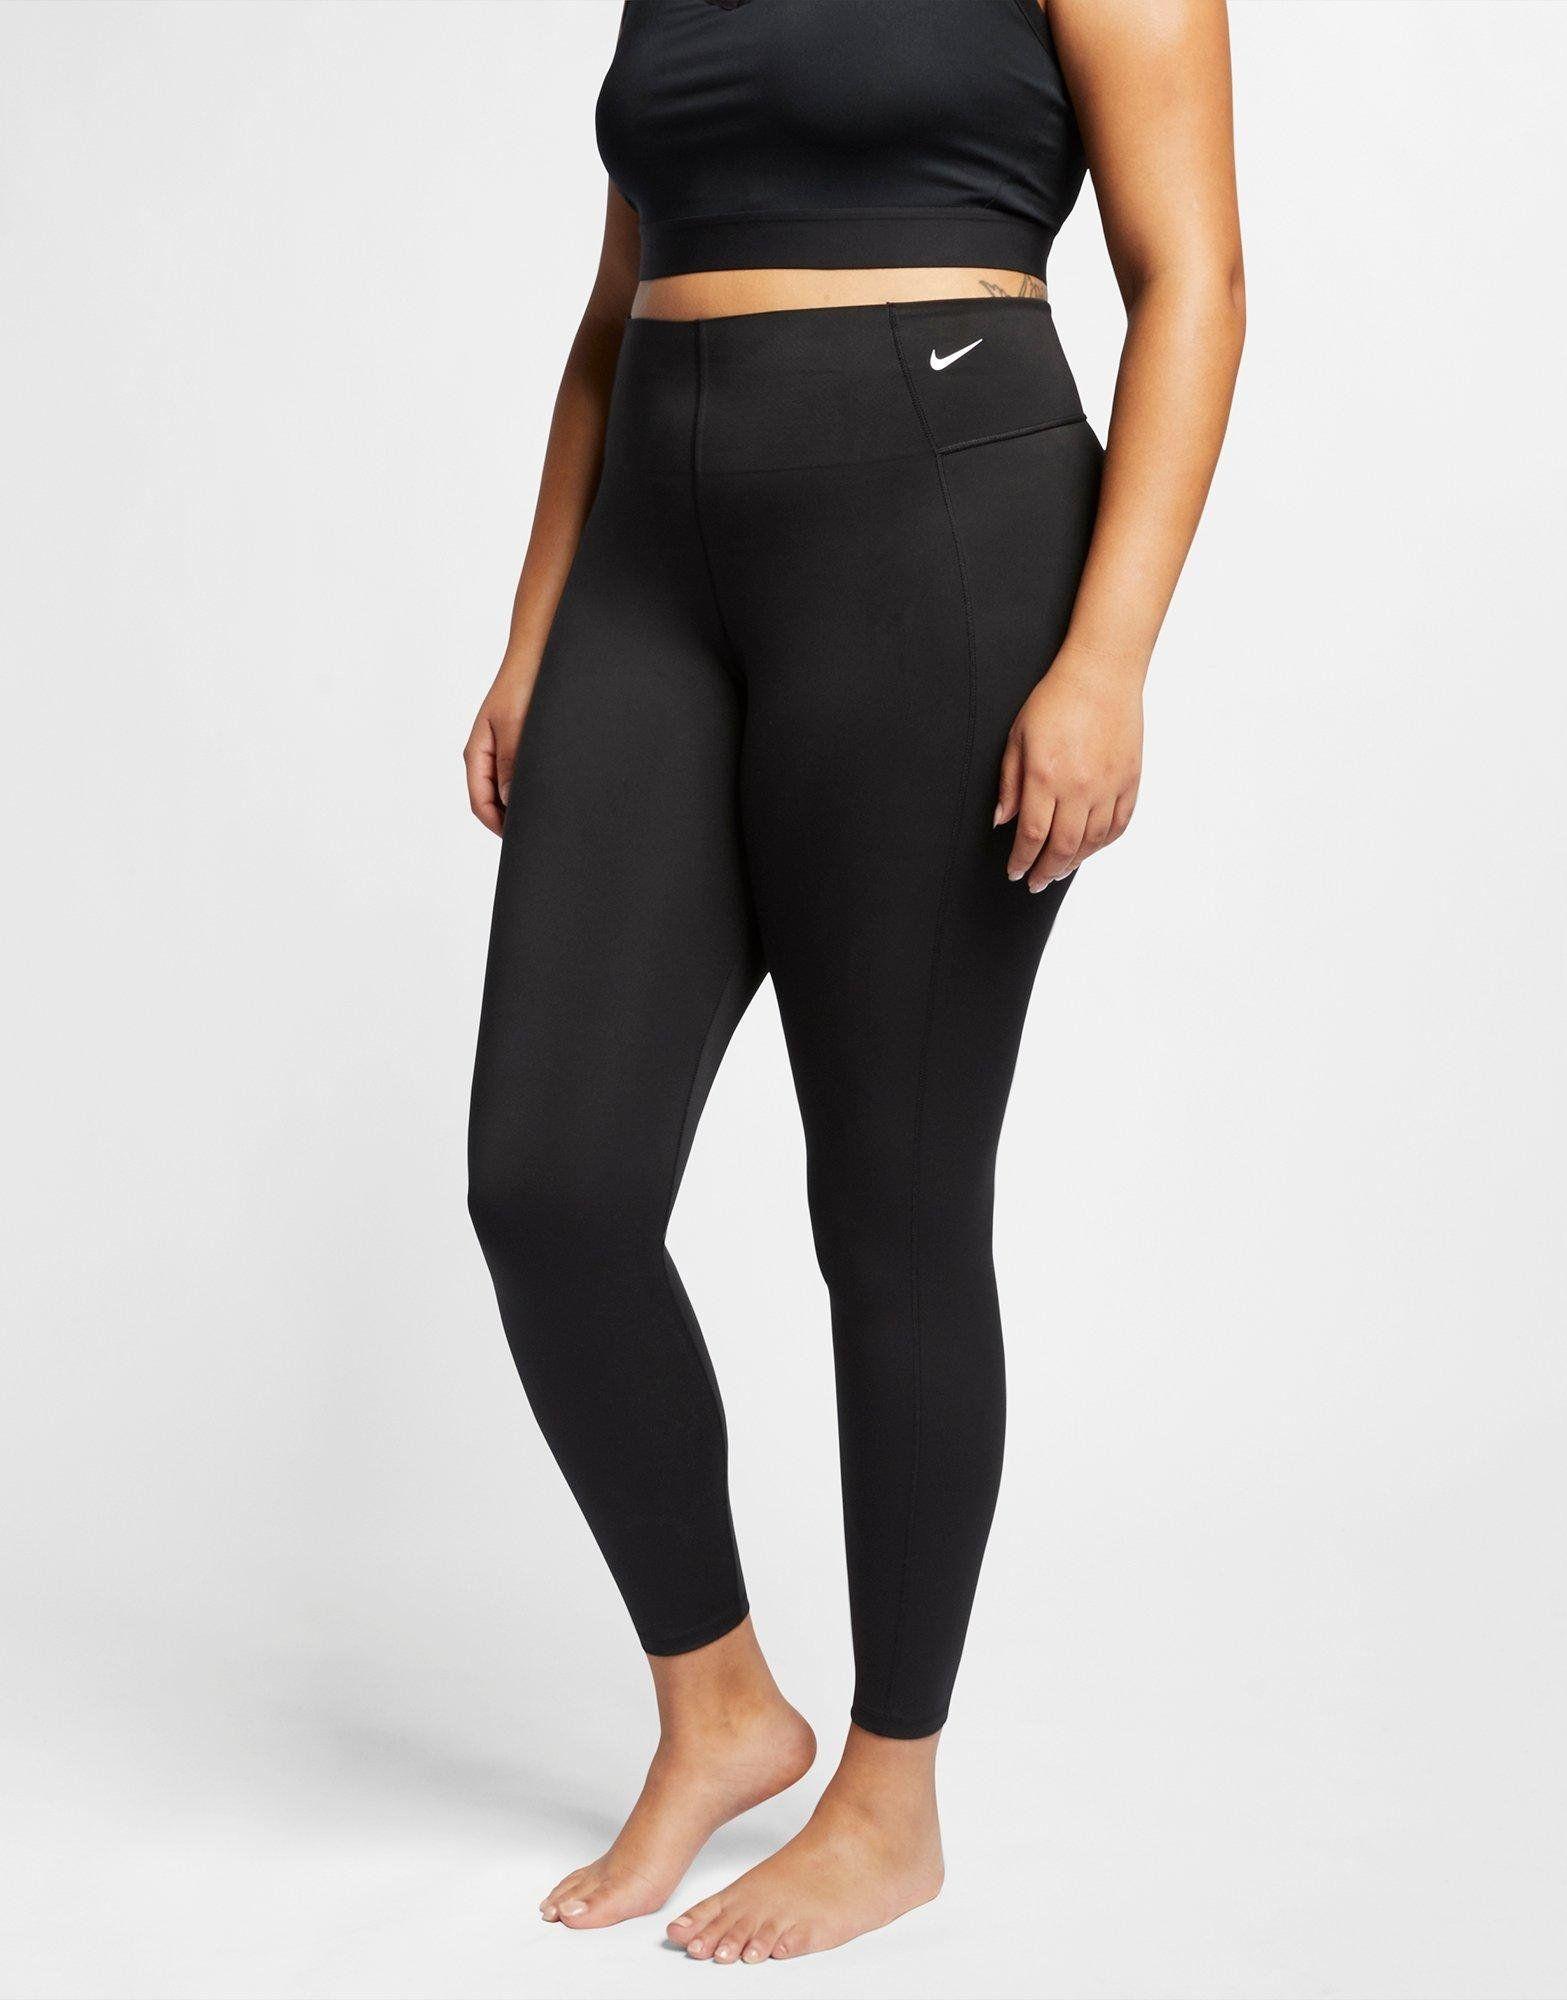 NIKE Nike Sculpt Women's Training Tights (Plus Size)